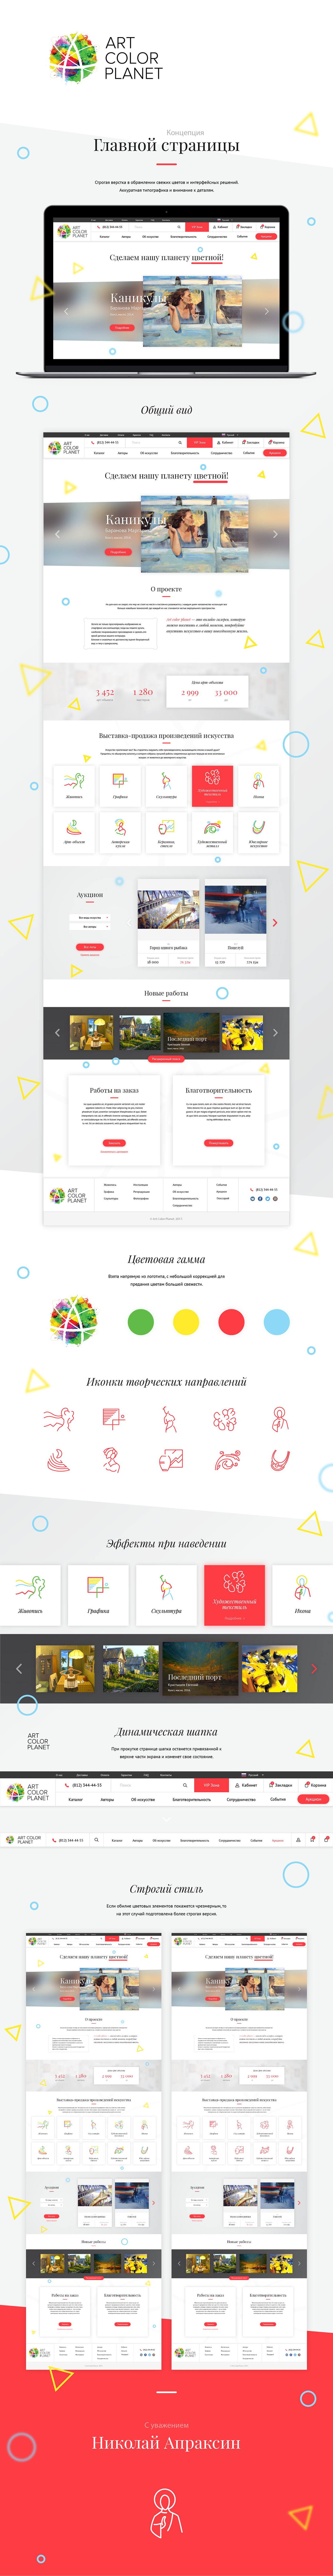 Webdesign,user interface